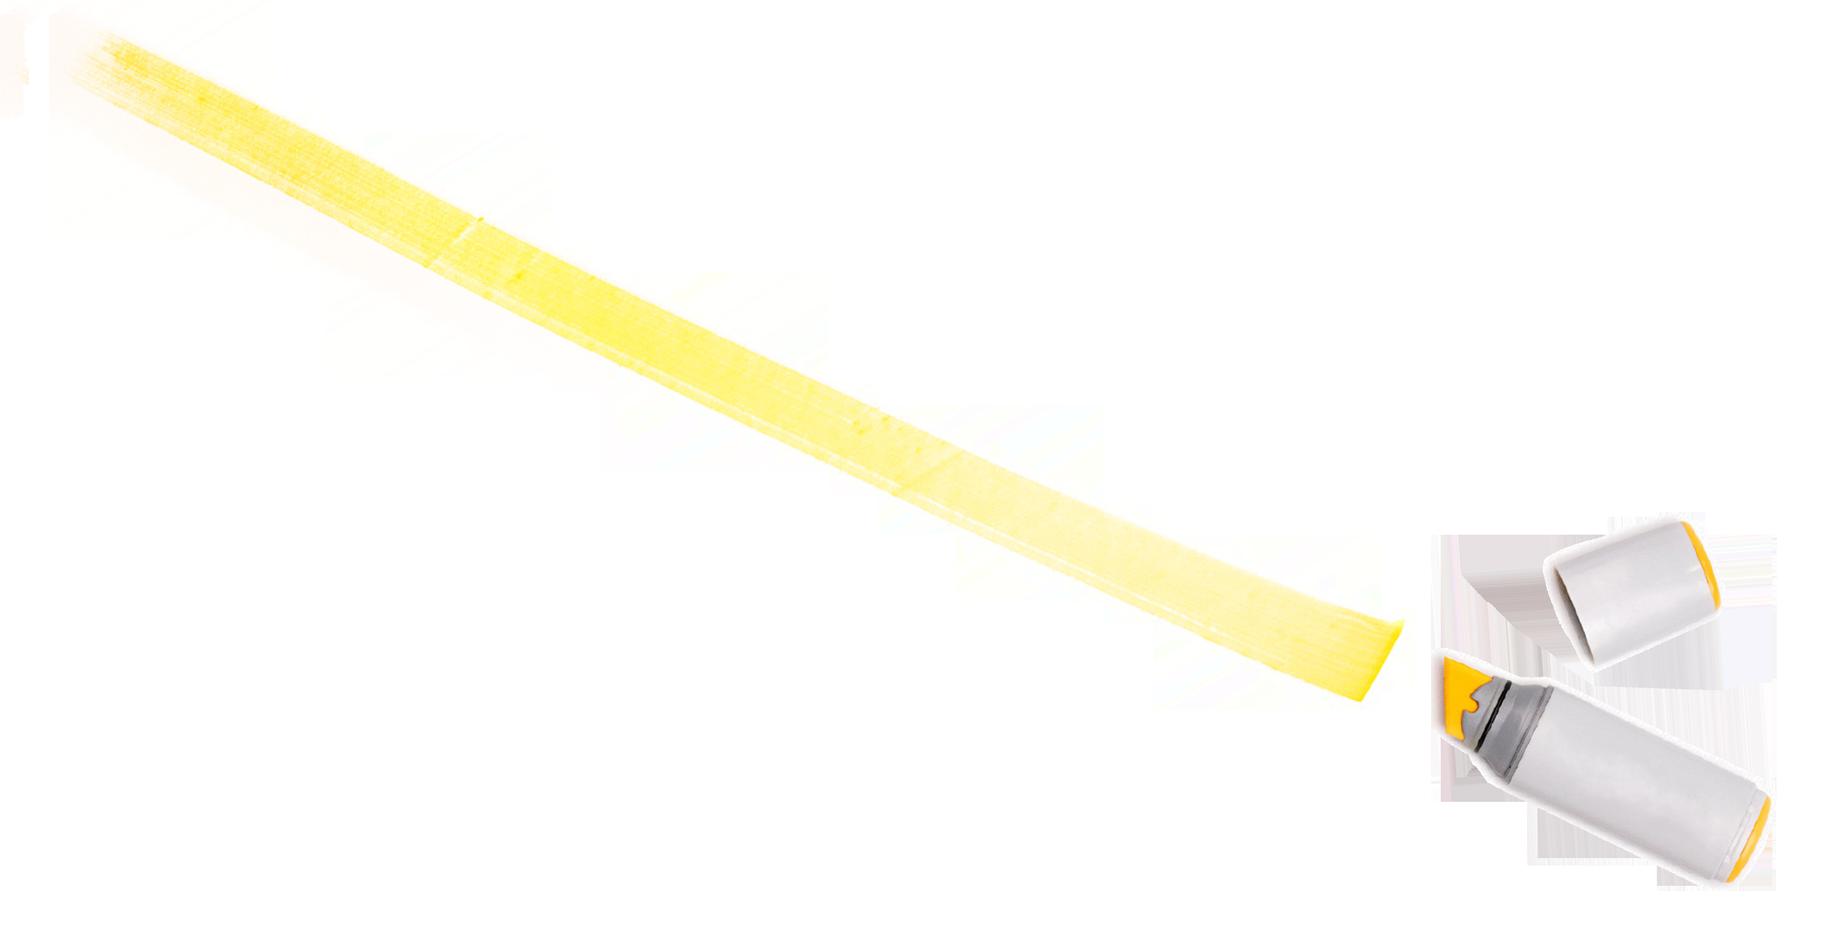 copiclijn_002